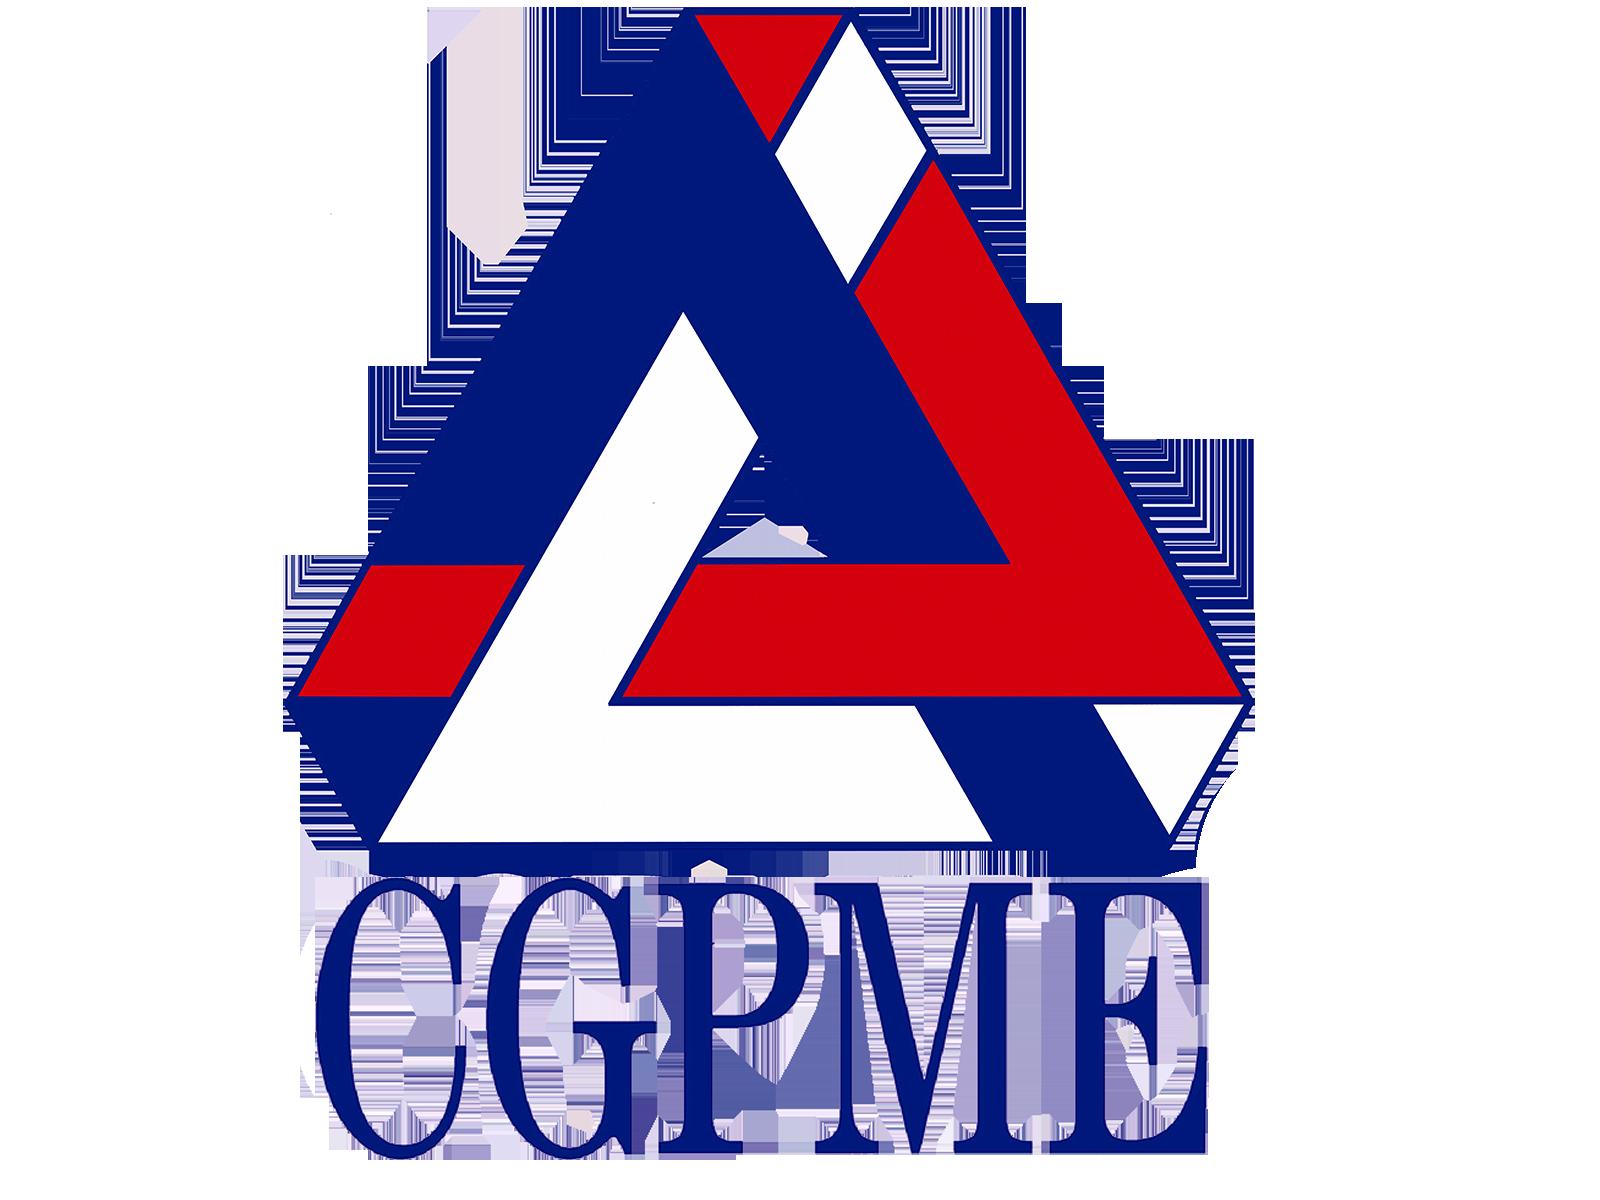 https://altemis-conseil.fr/wp-content/uploads/2015/09/CGPME.png